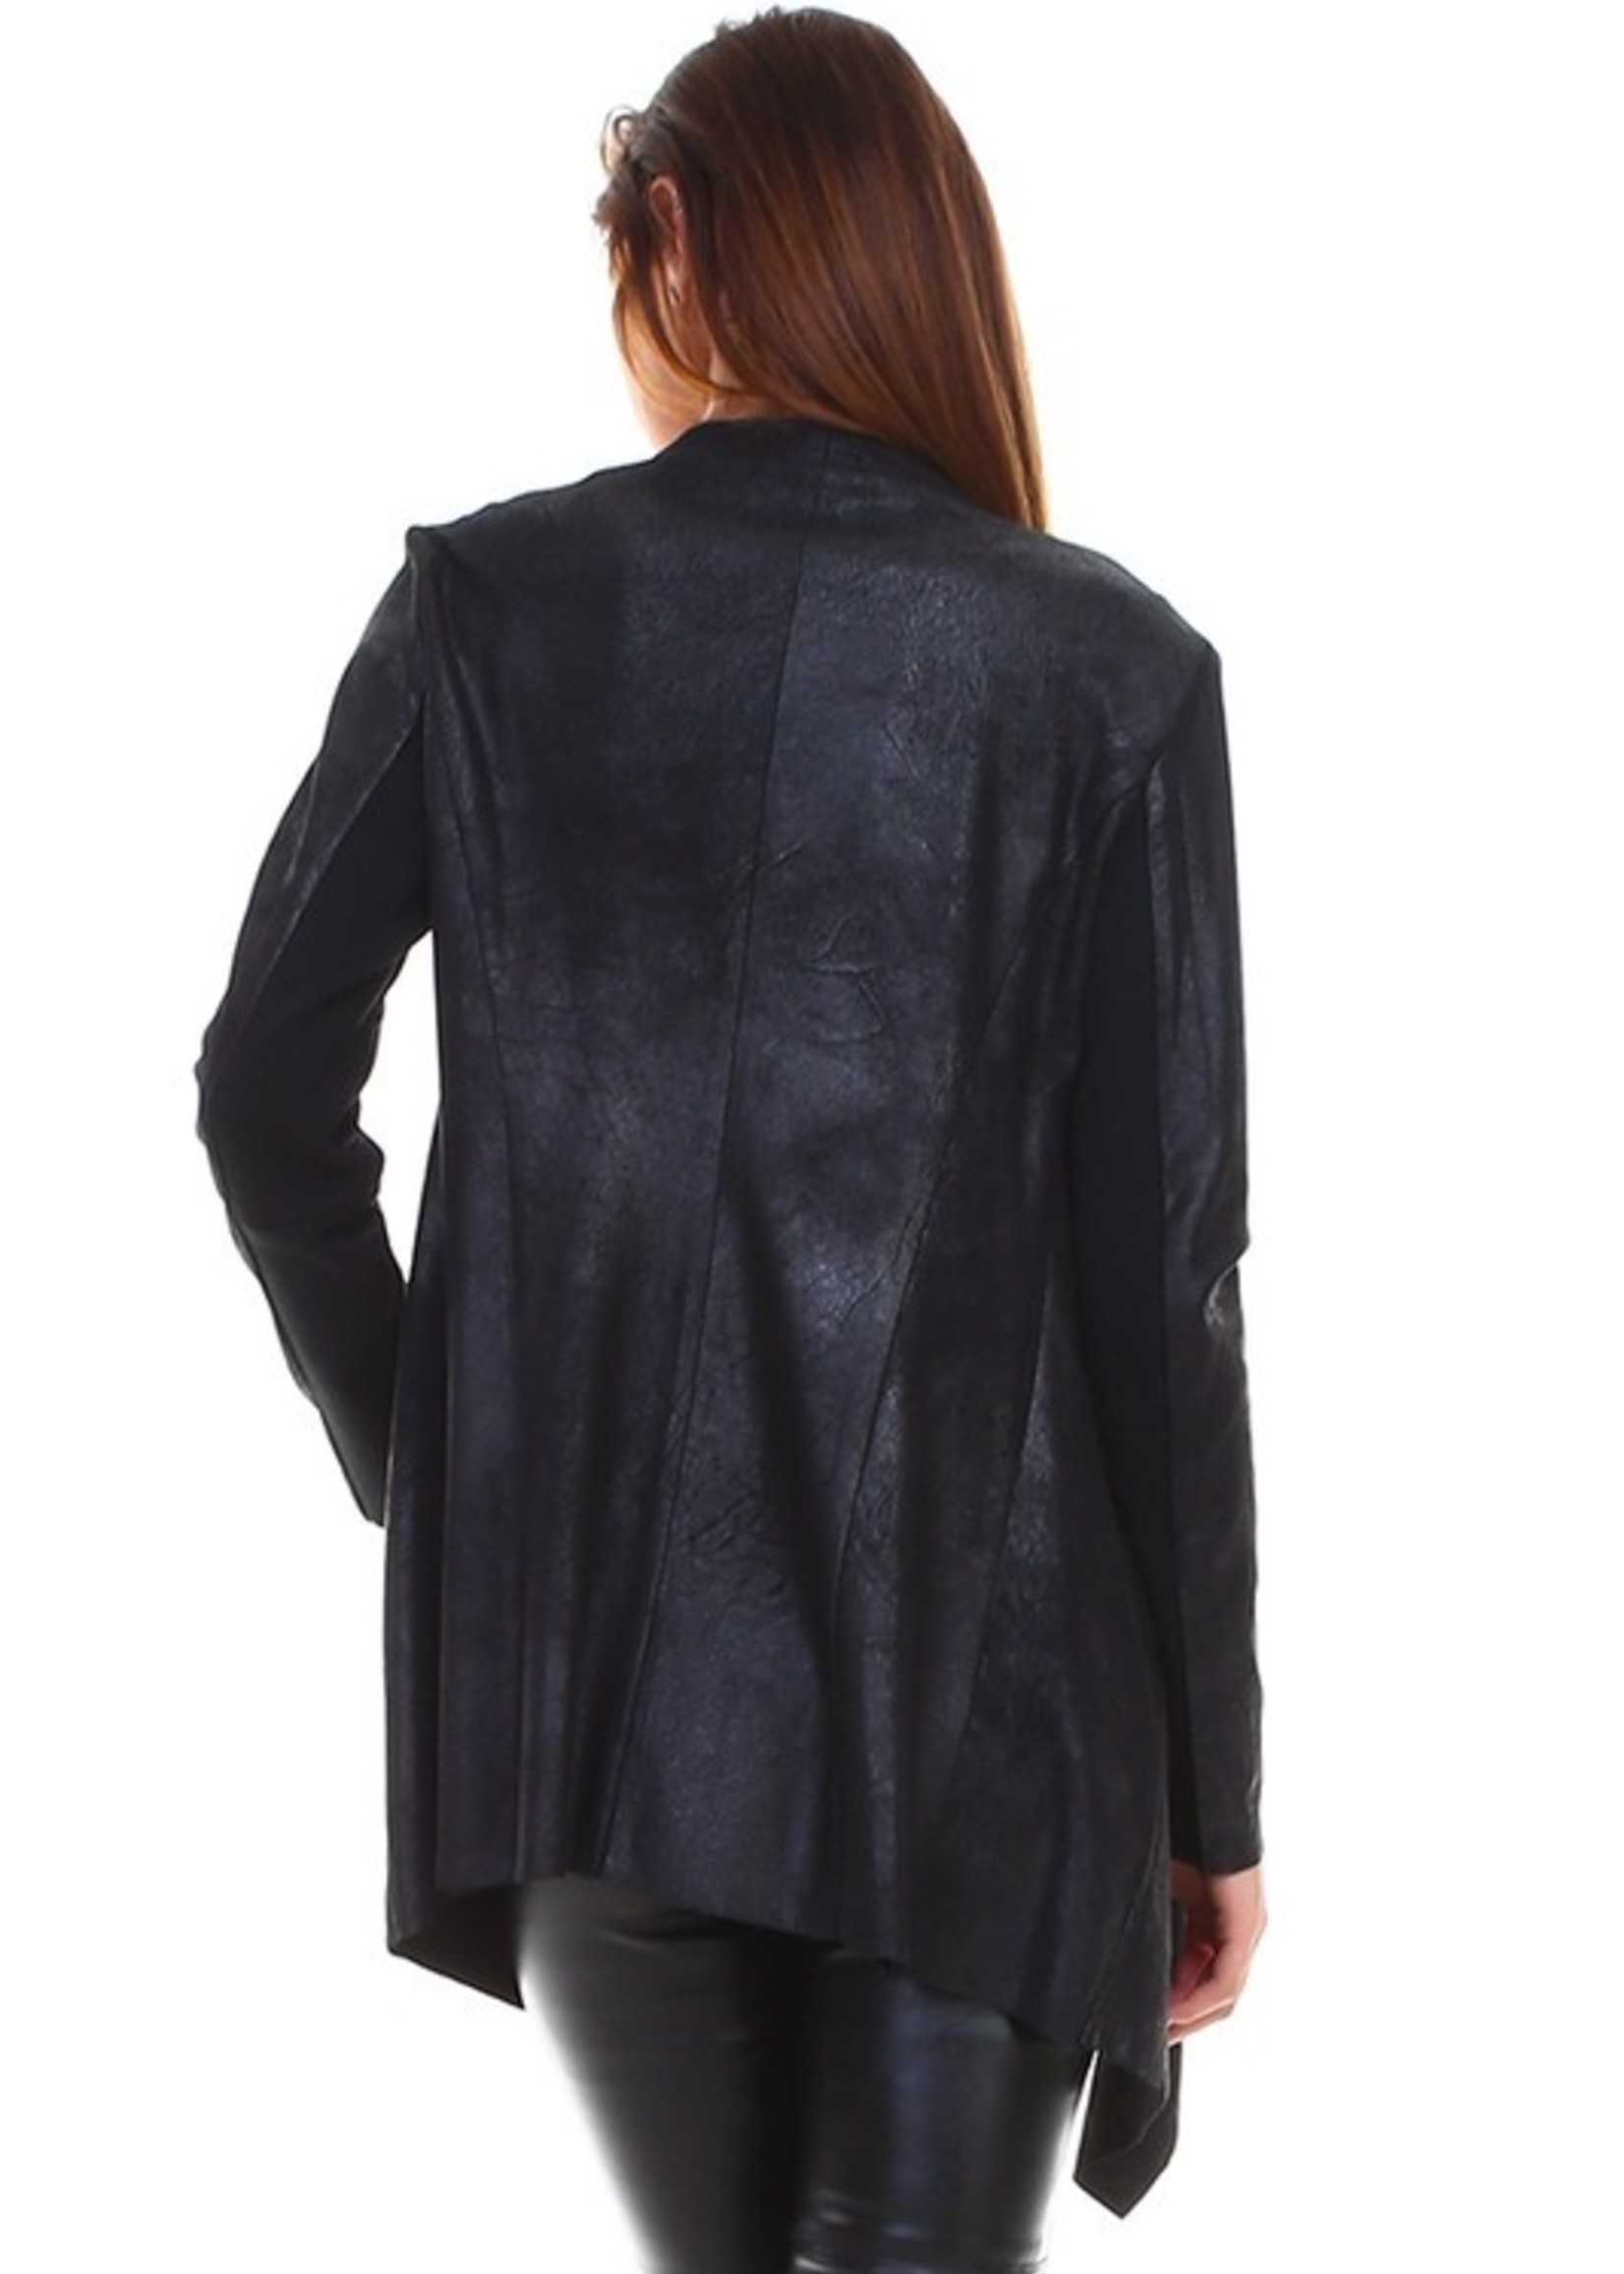 Leather open cardigan